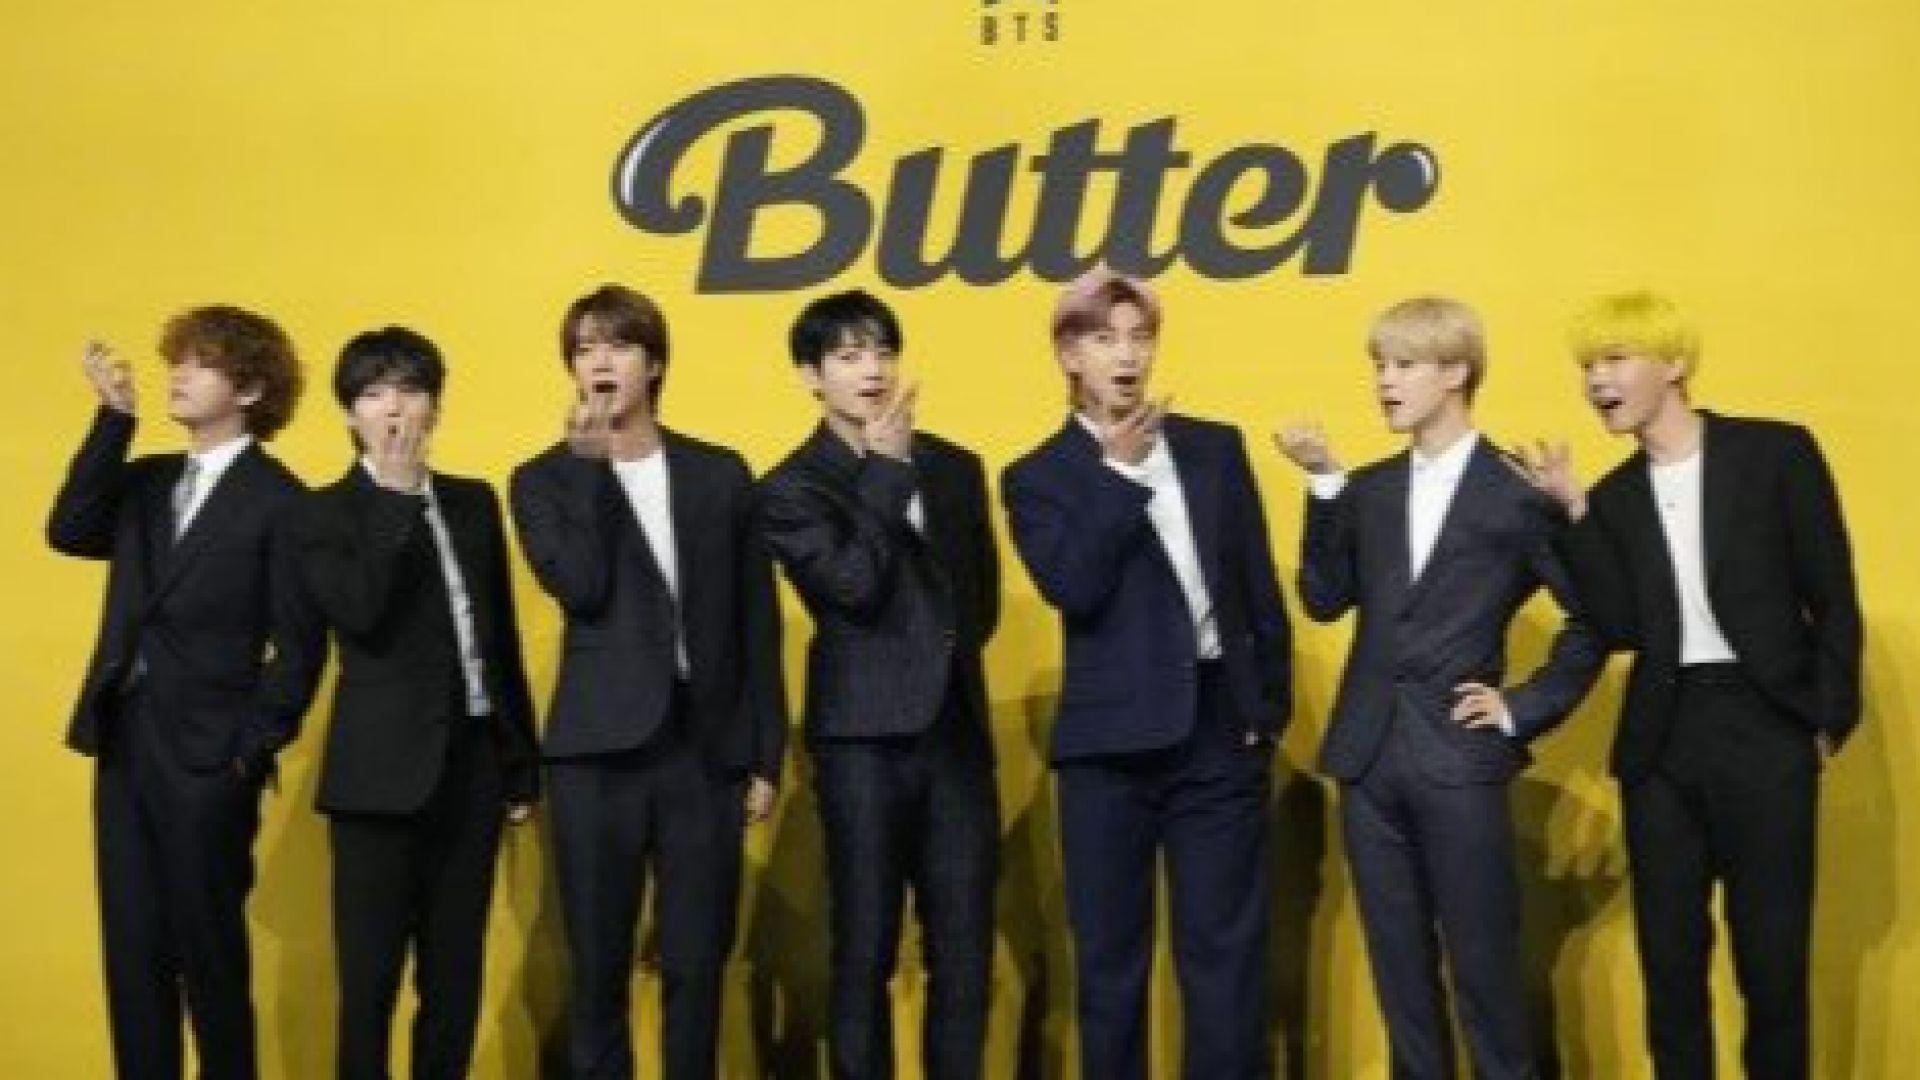 Пекин блокира десетки акаунти на фенклубове на корейски поп звезди